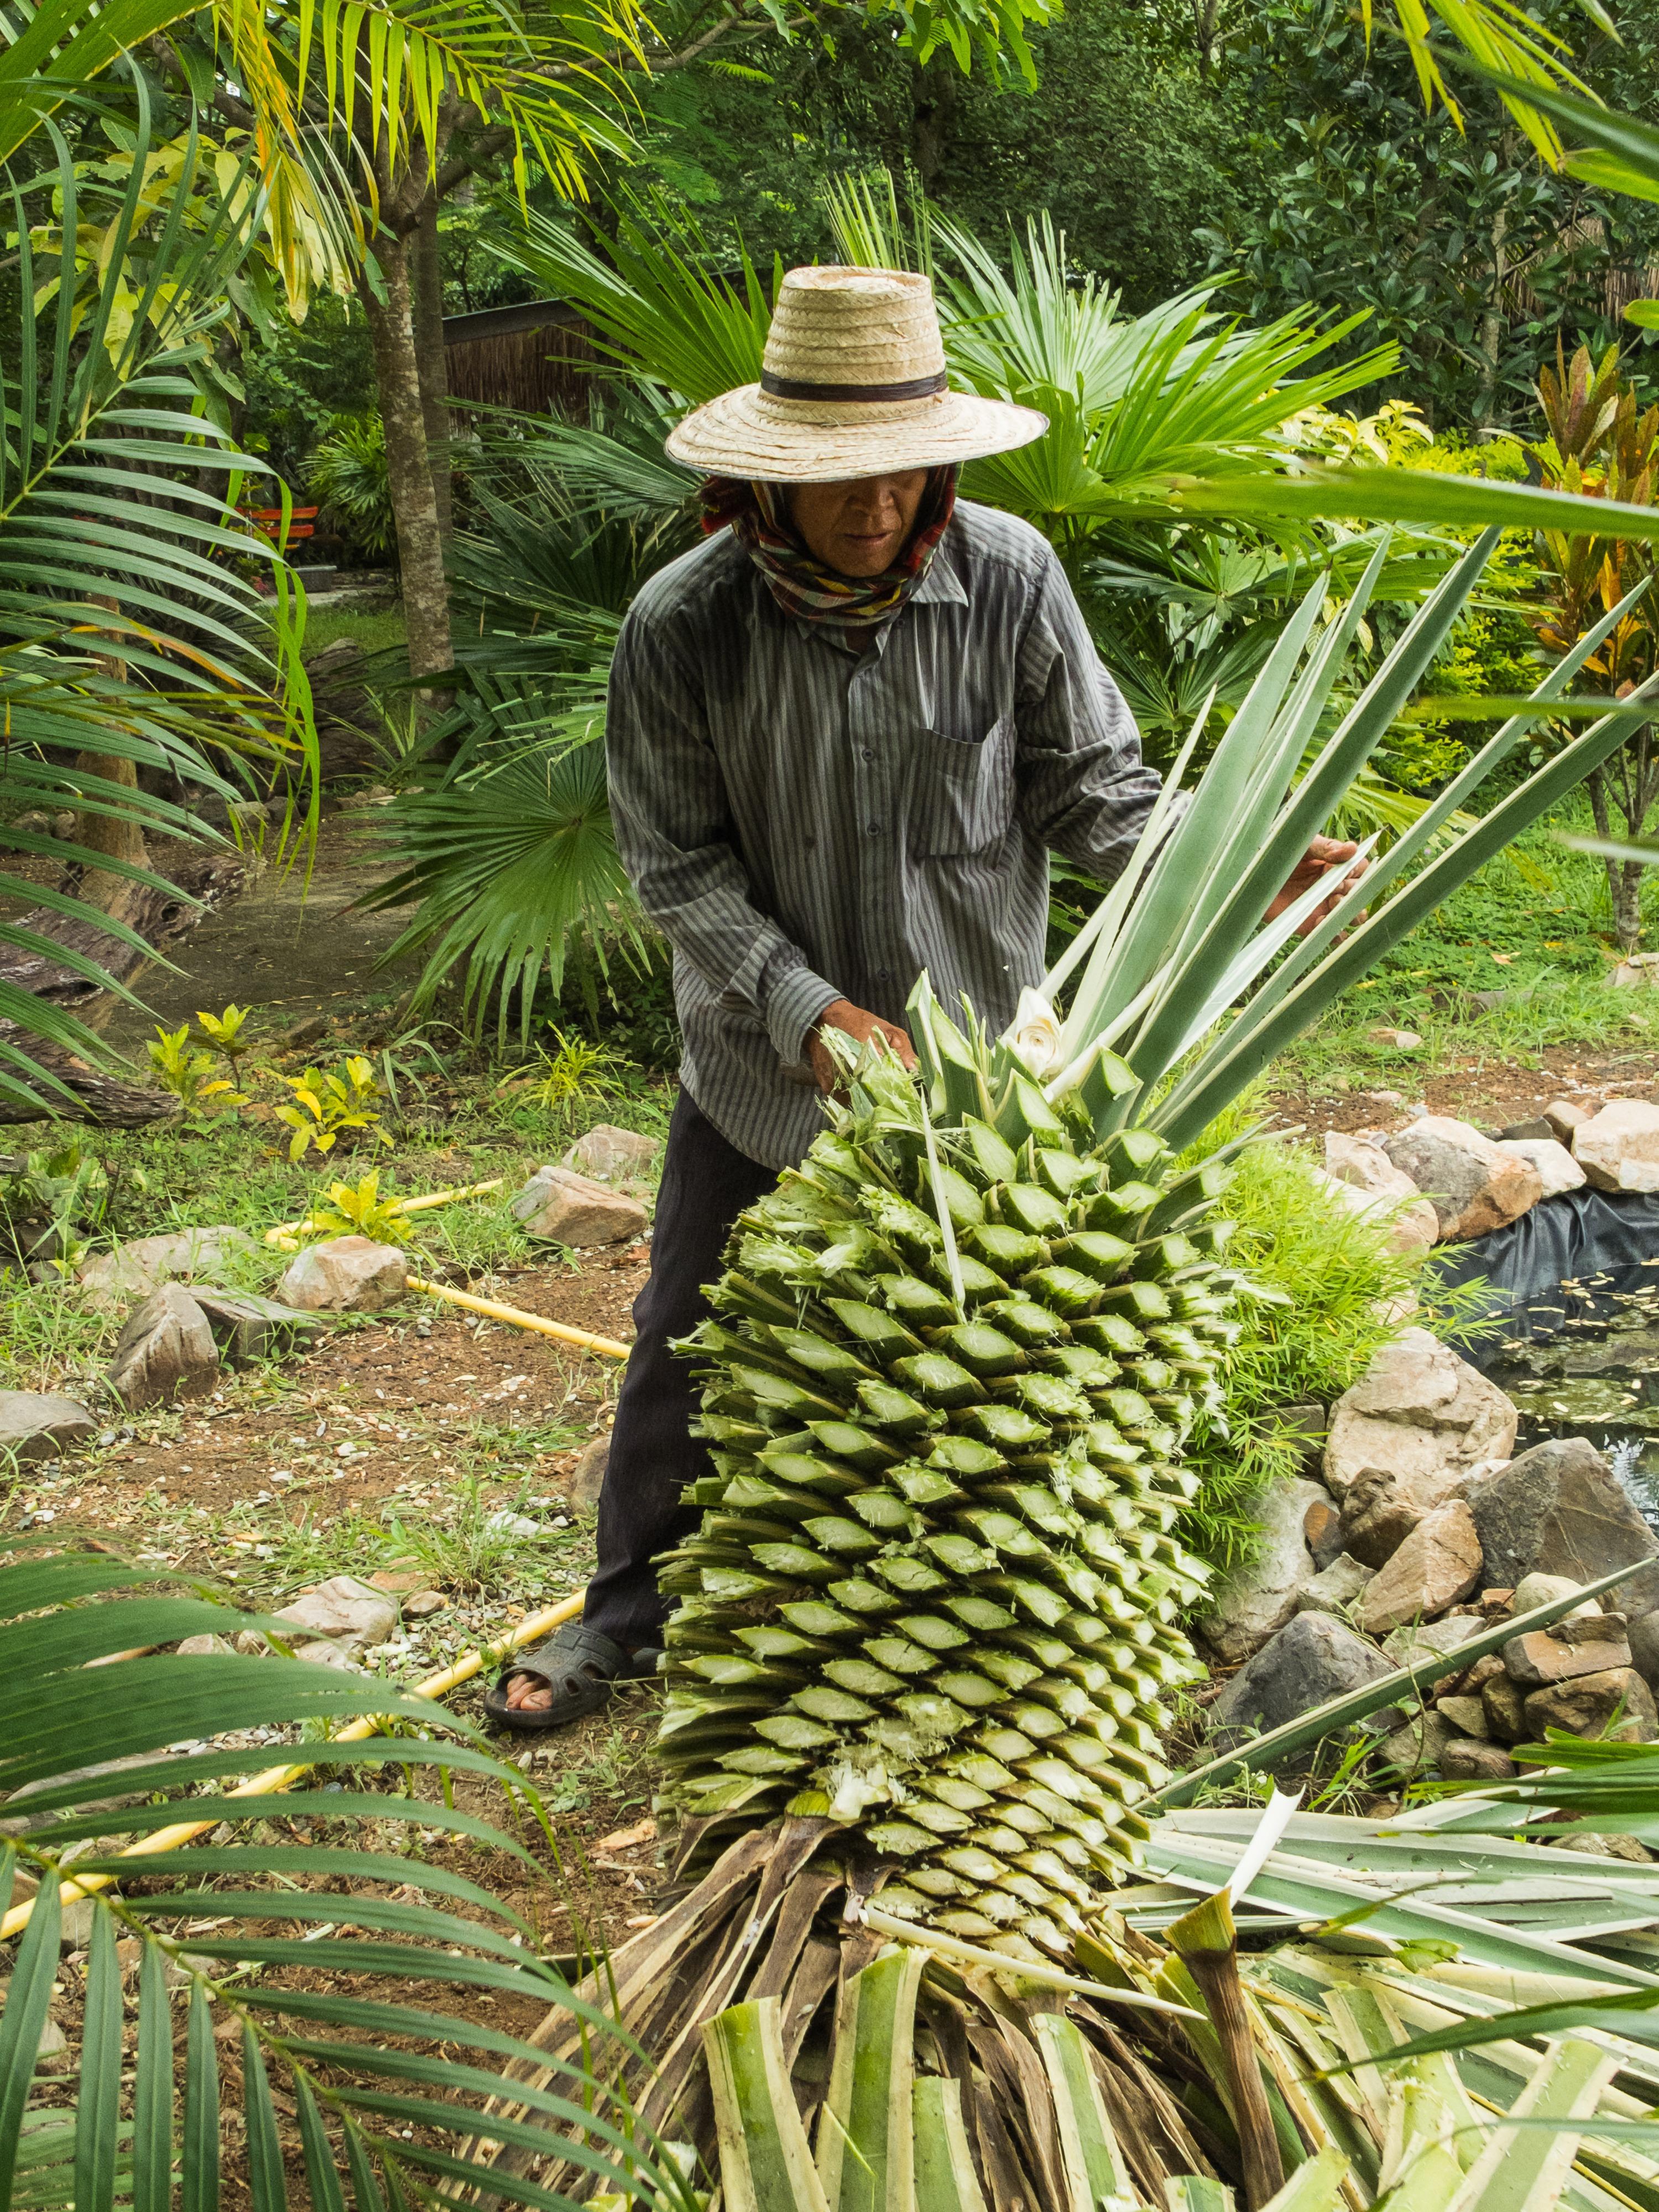 Fotos gratis rbol c sped planta cultivo agricultura - Arbol de pina ...